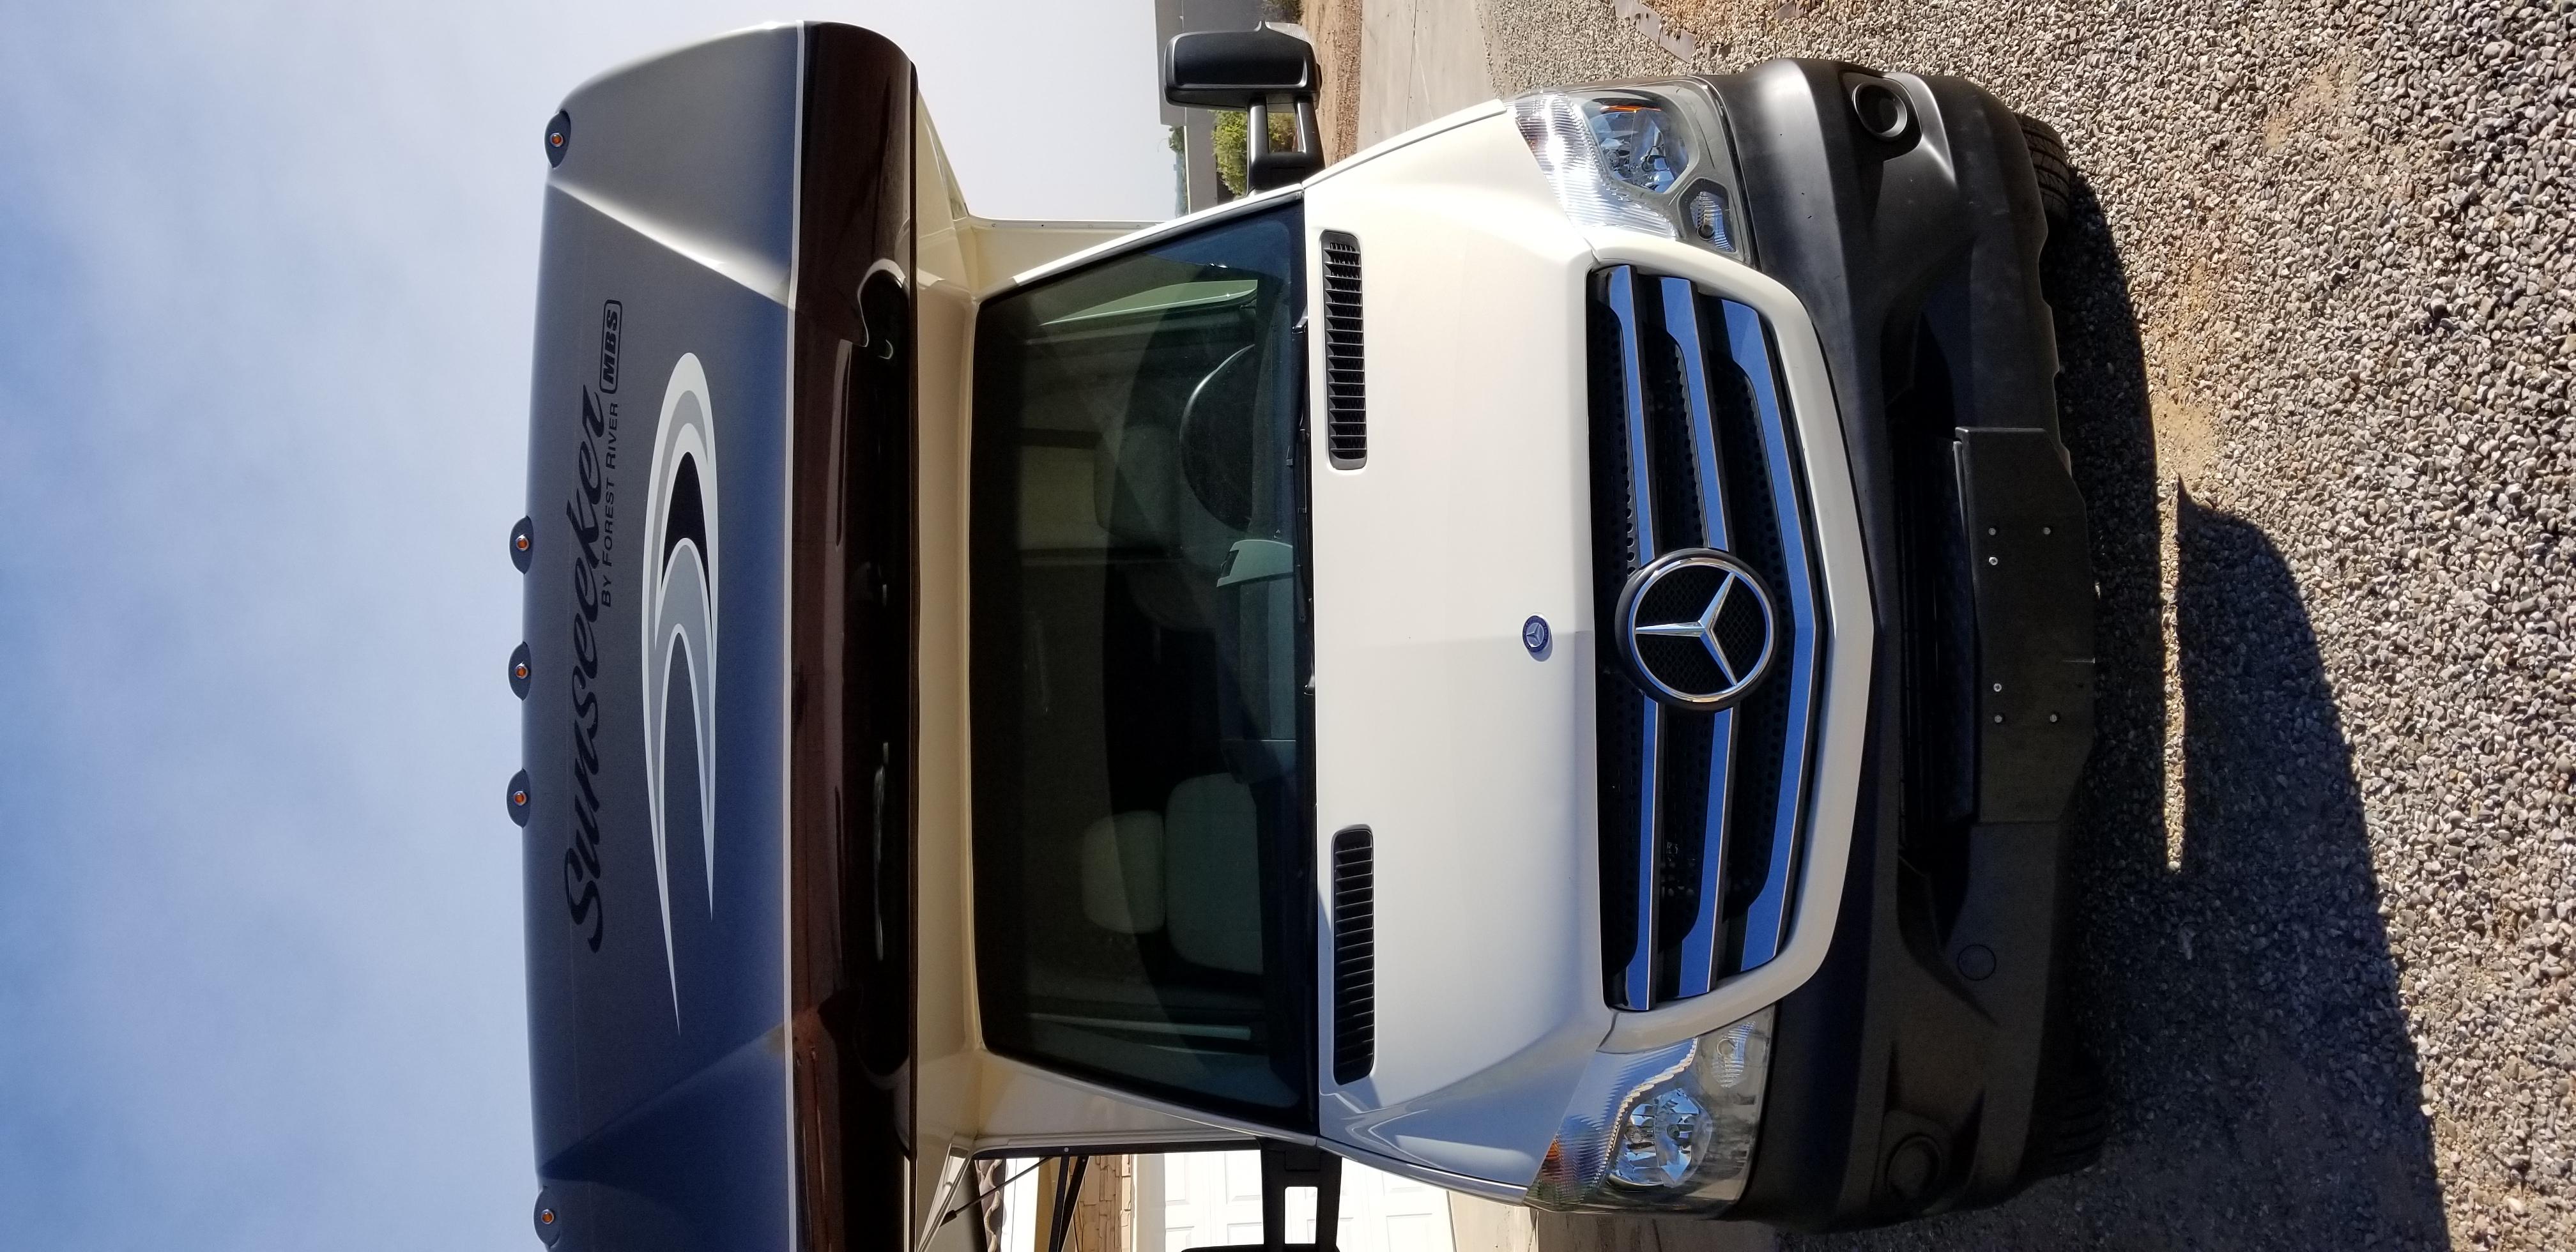 Mercedes Benz 3500 Sprinter Chassis. Forest River Sunseeker 2016